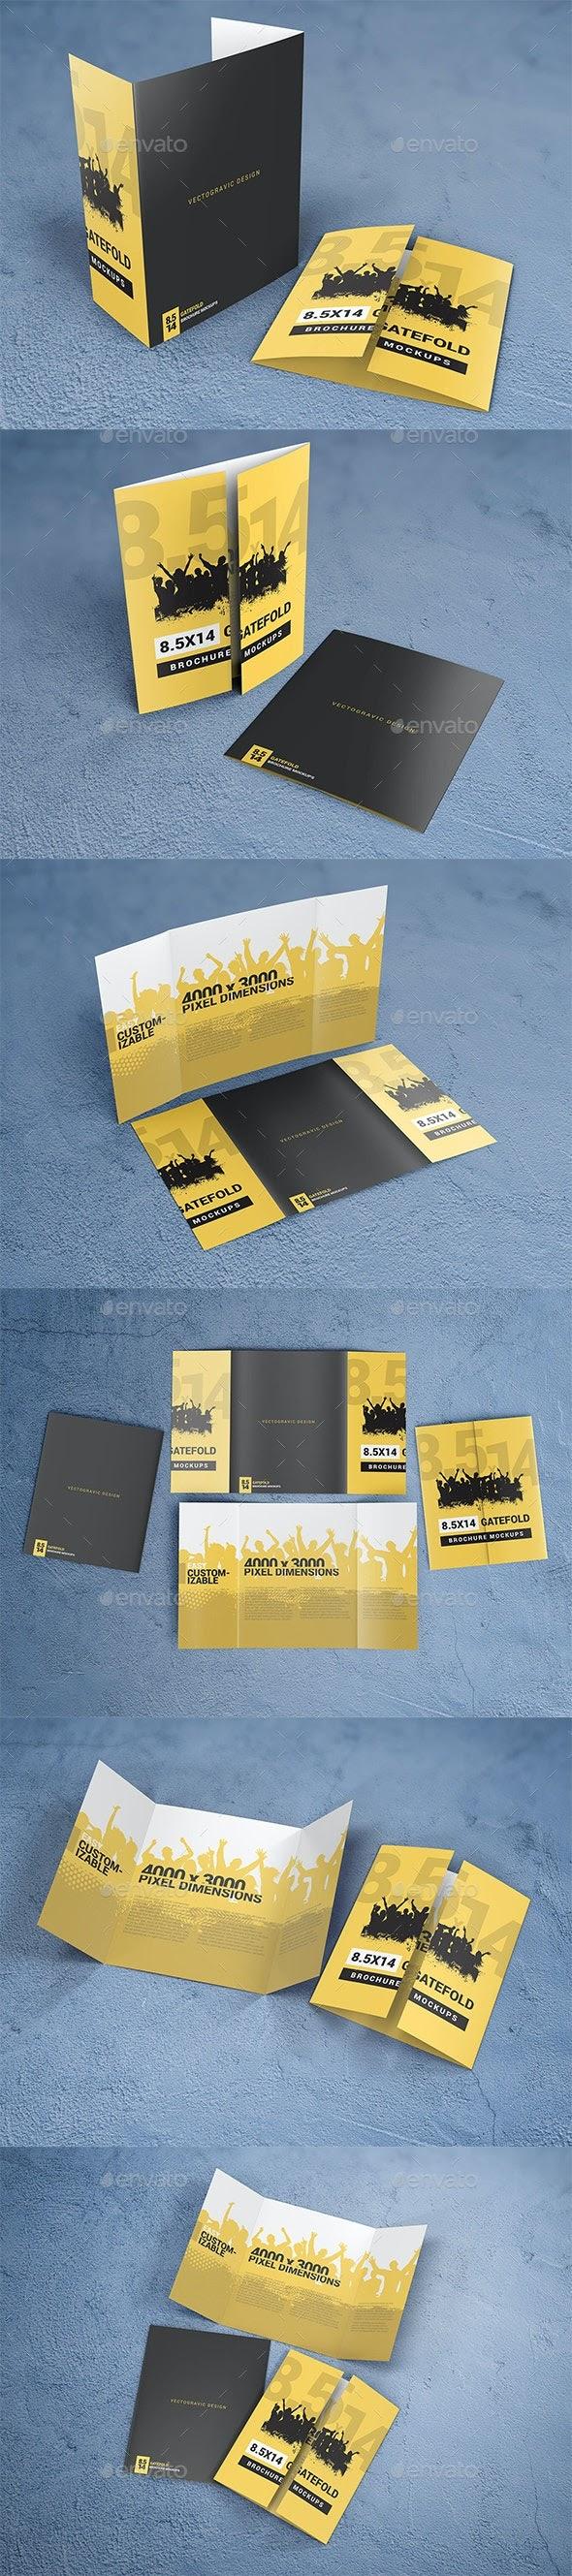 Easy to custom Print Mockups - 8.5×14 Gate Fold Brochure Mockups